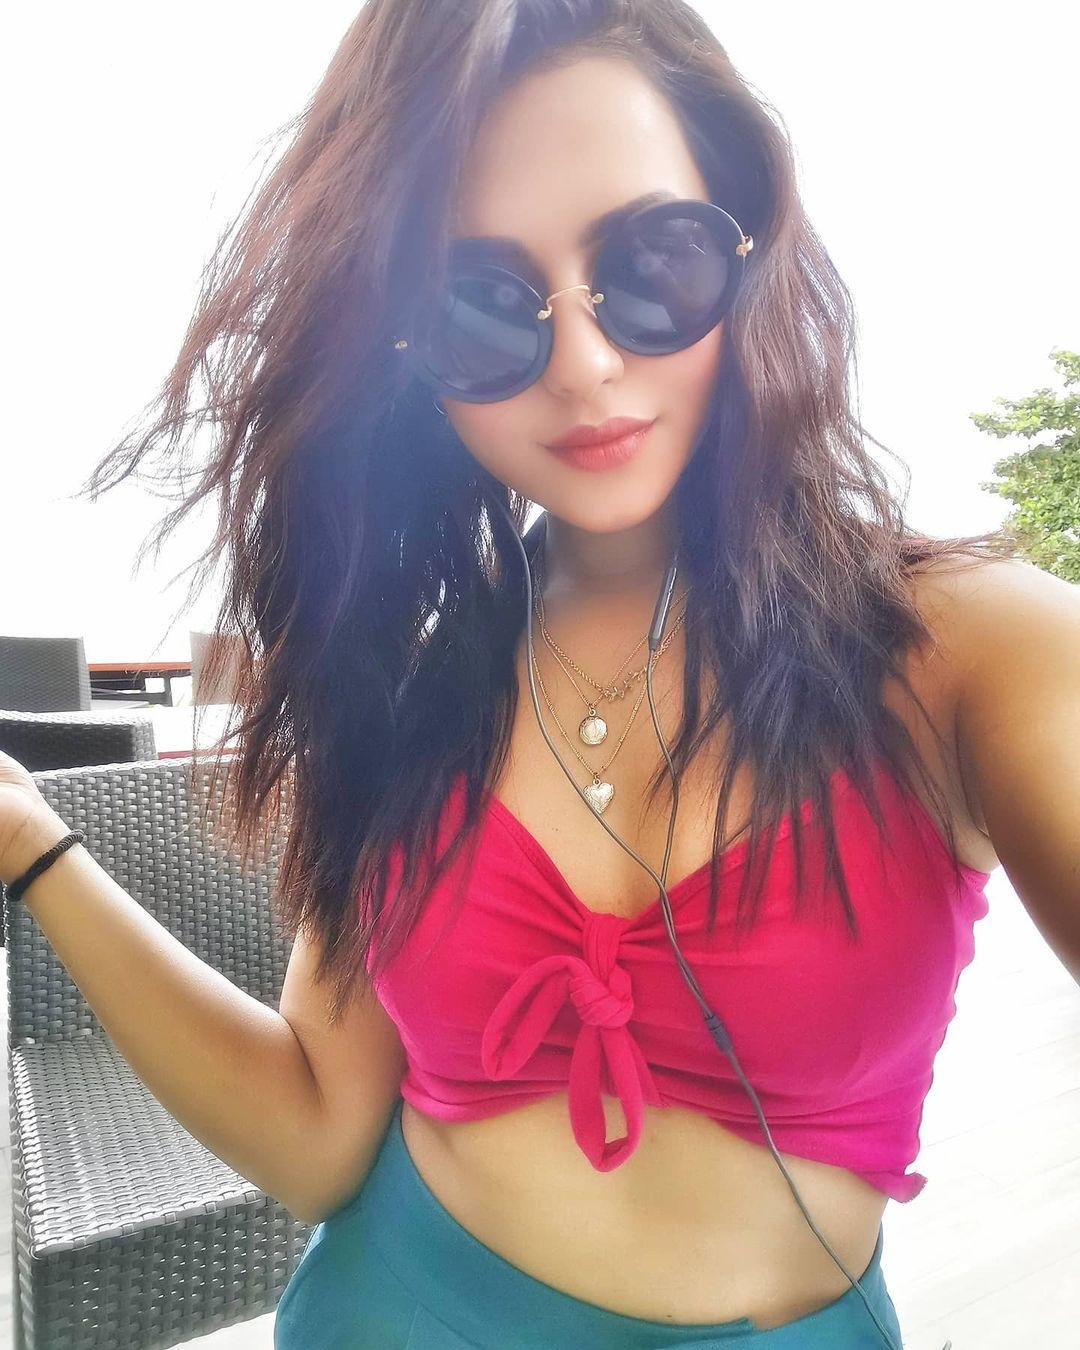 Stylish Girl DP